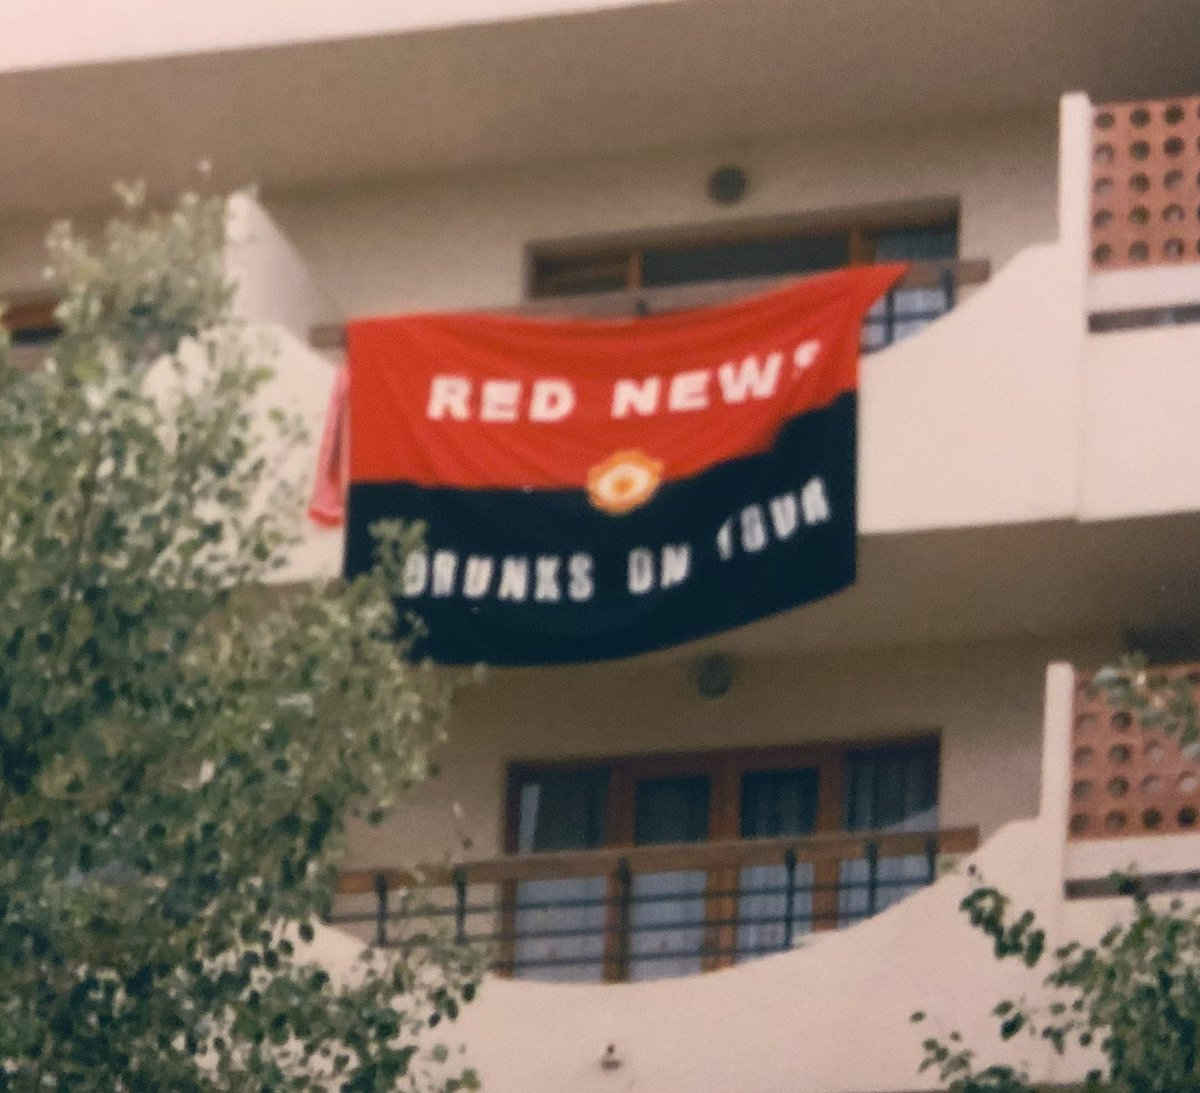 #Treble99 ❤️🤍🖤 🏆🏆🏆@barneyrednews #Magaluf1999 #21YearsAgo https://t.co/GCjotDrtGS